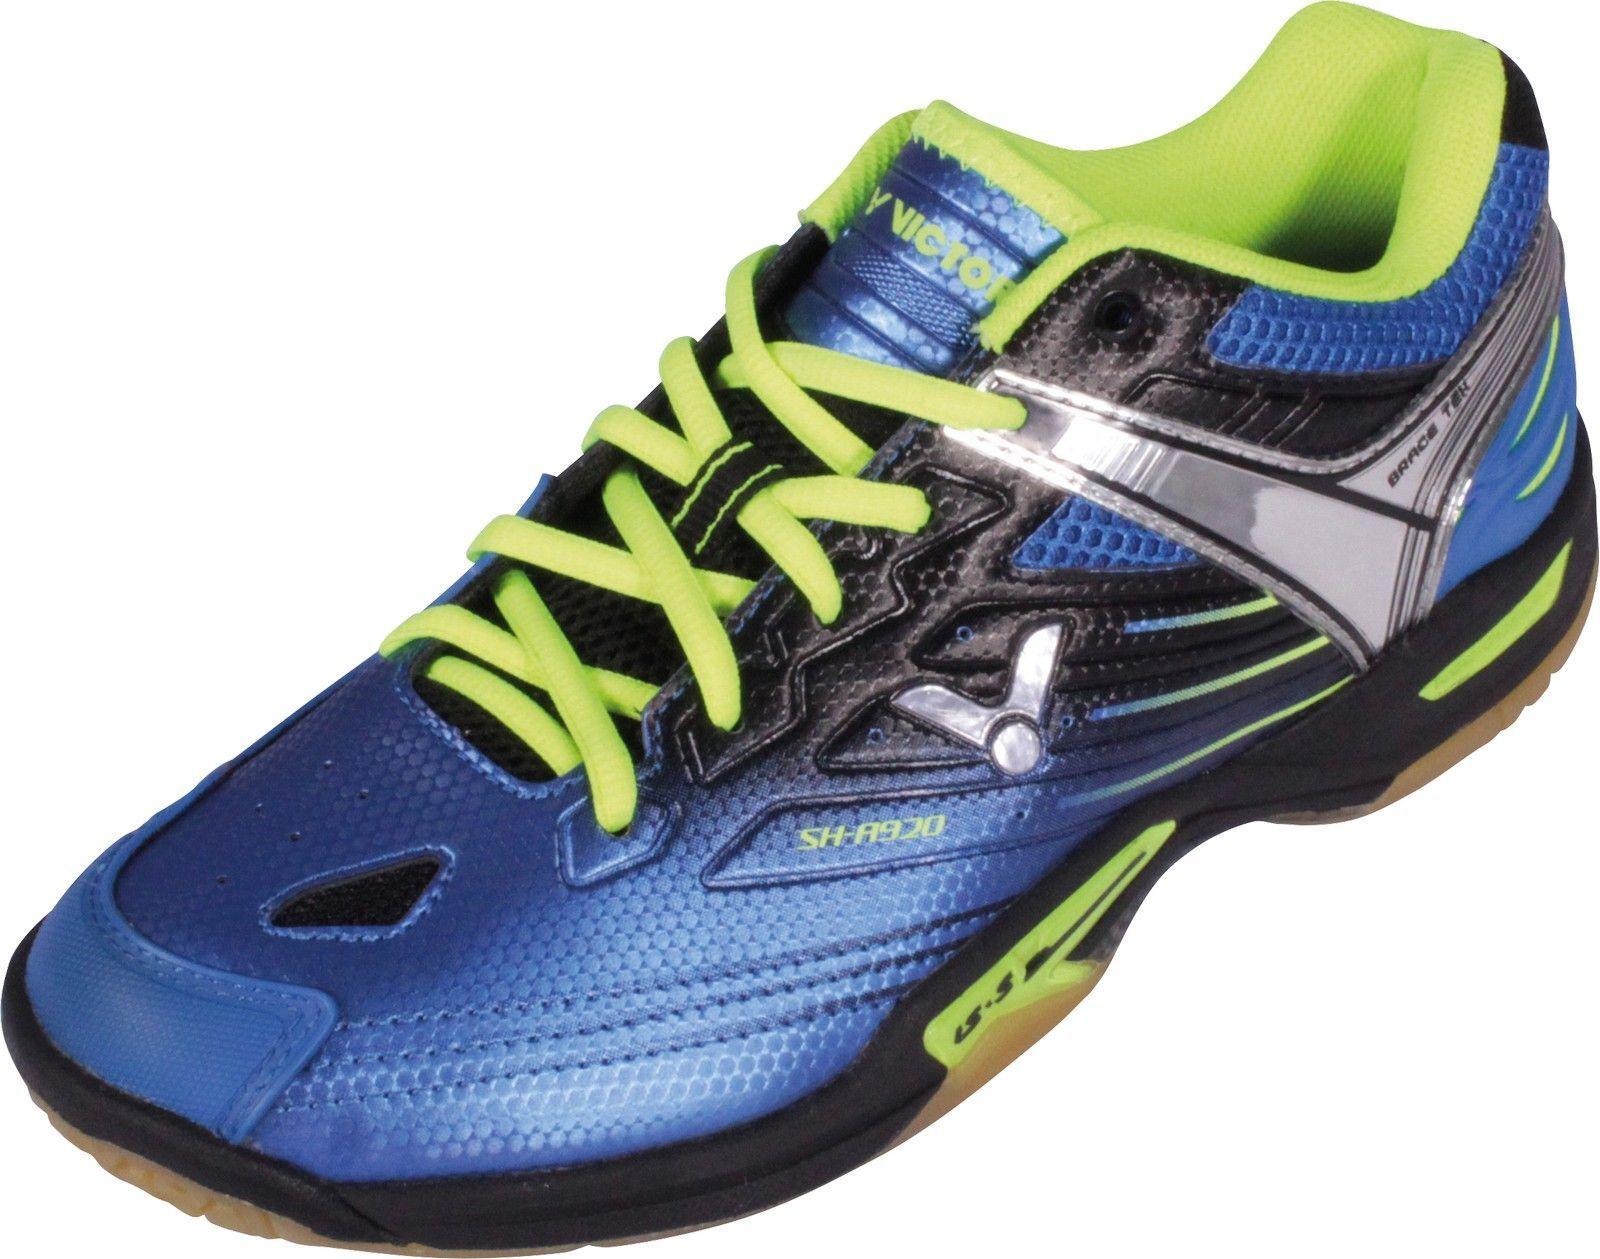 Victor SH-A920 Blau   Schuh Badminton Tischtennis Squash